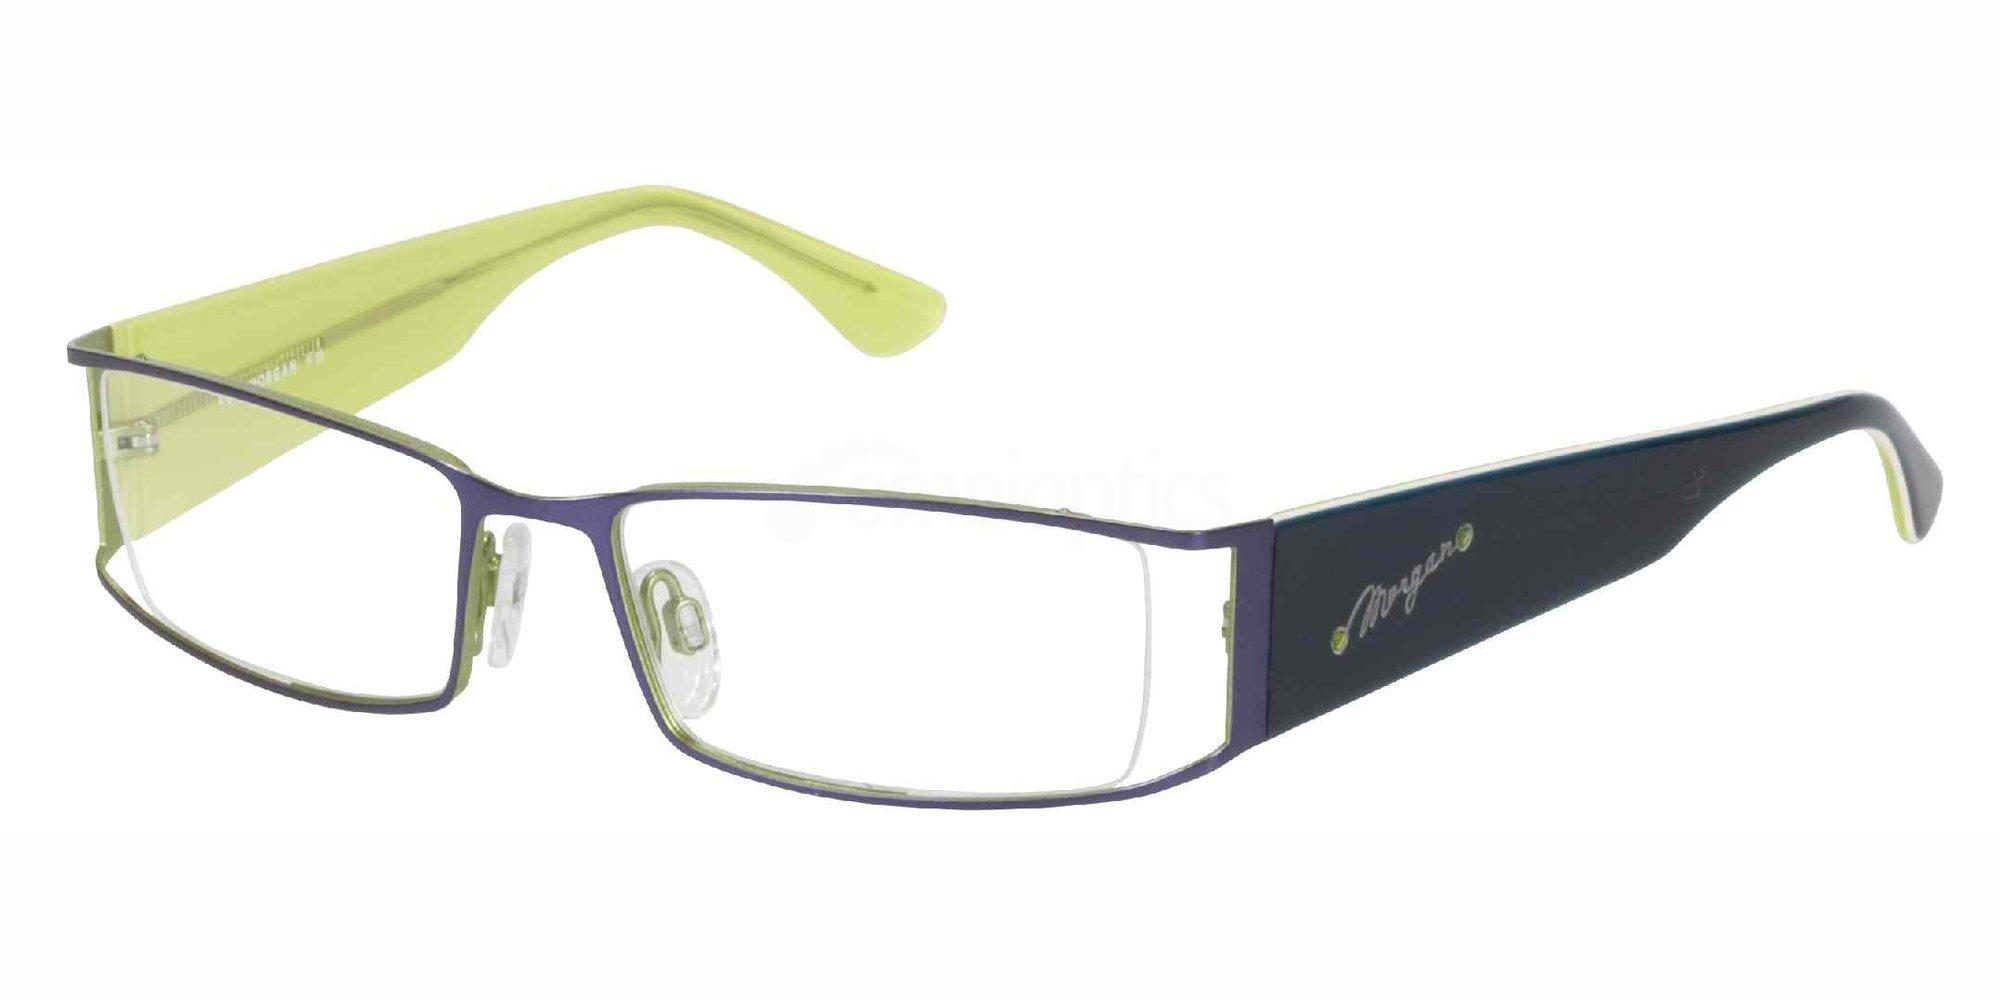 371 203104 , MORGAN Eyewear